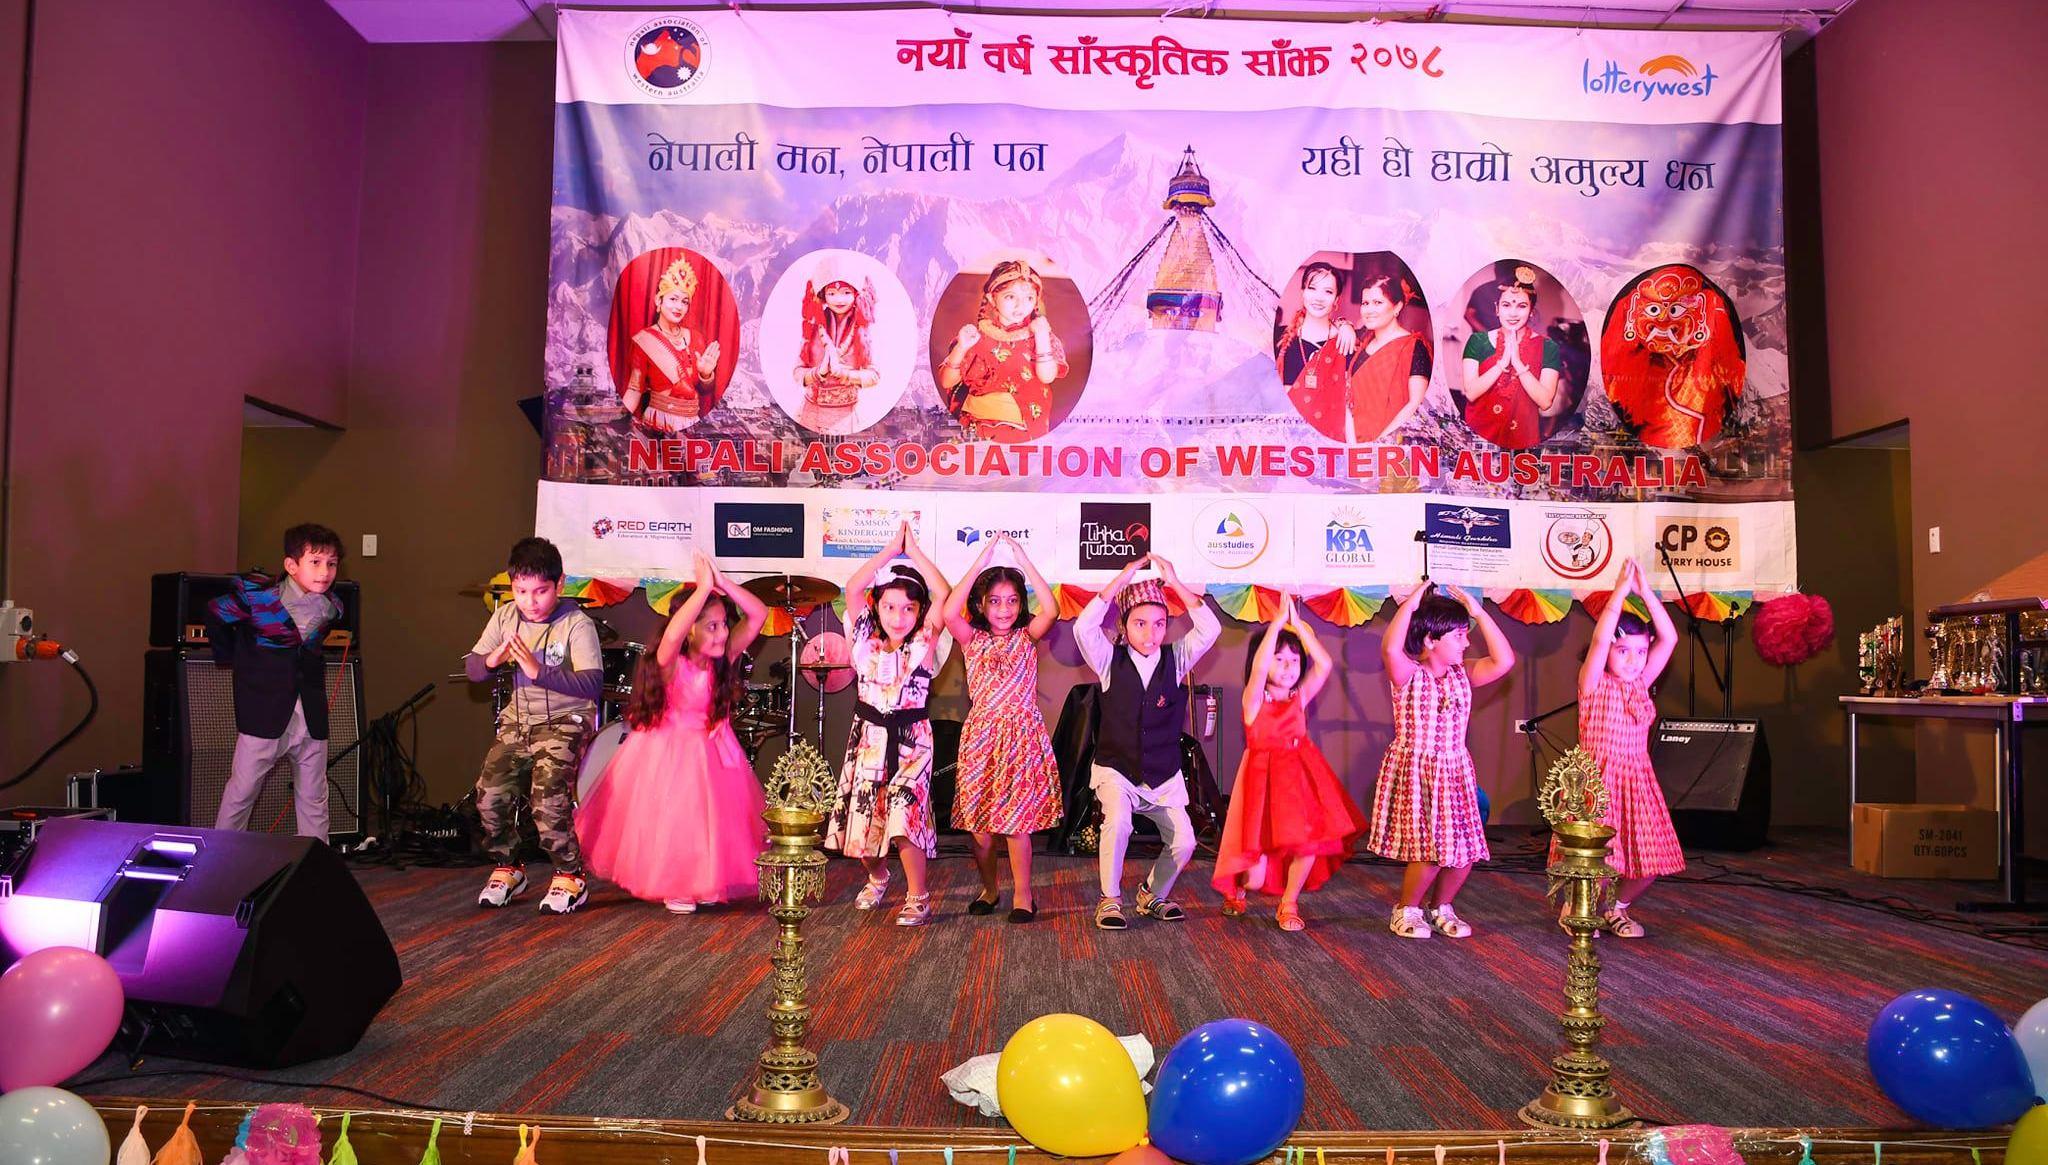 Nepalese New Year 2078 celebration organised Nepali Association of Western Australia